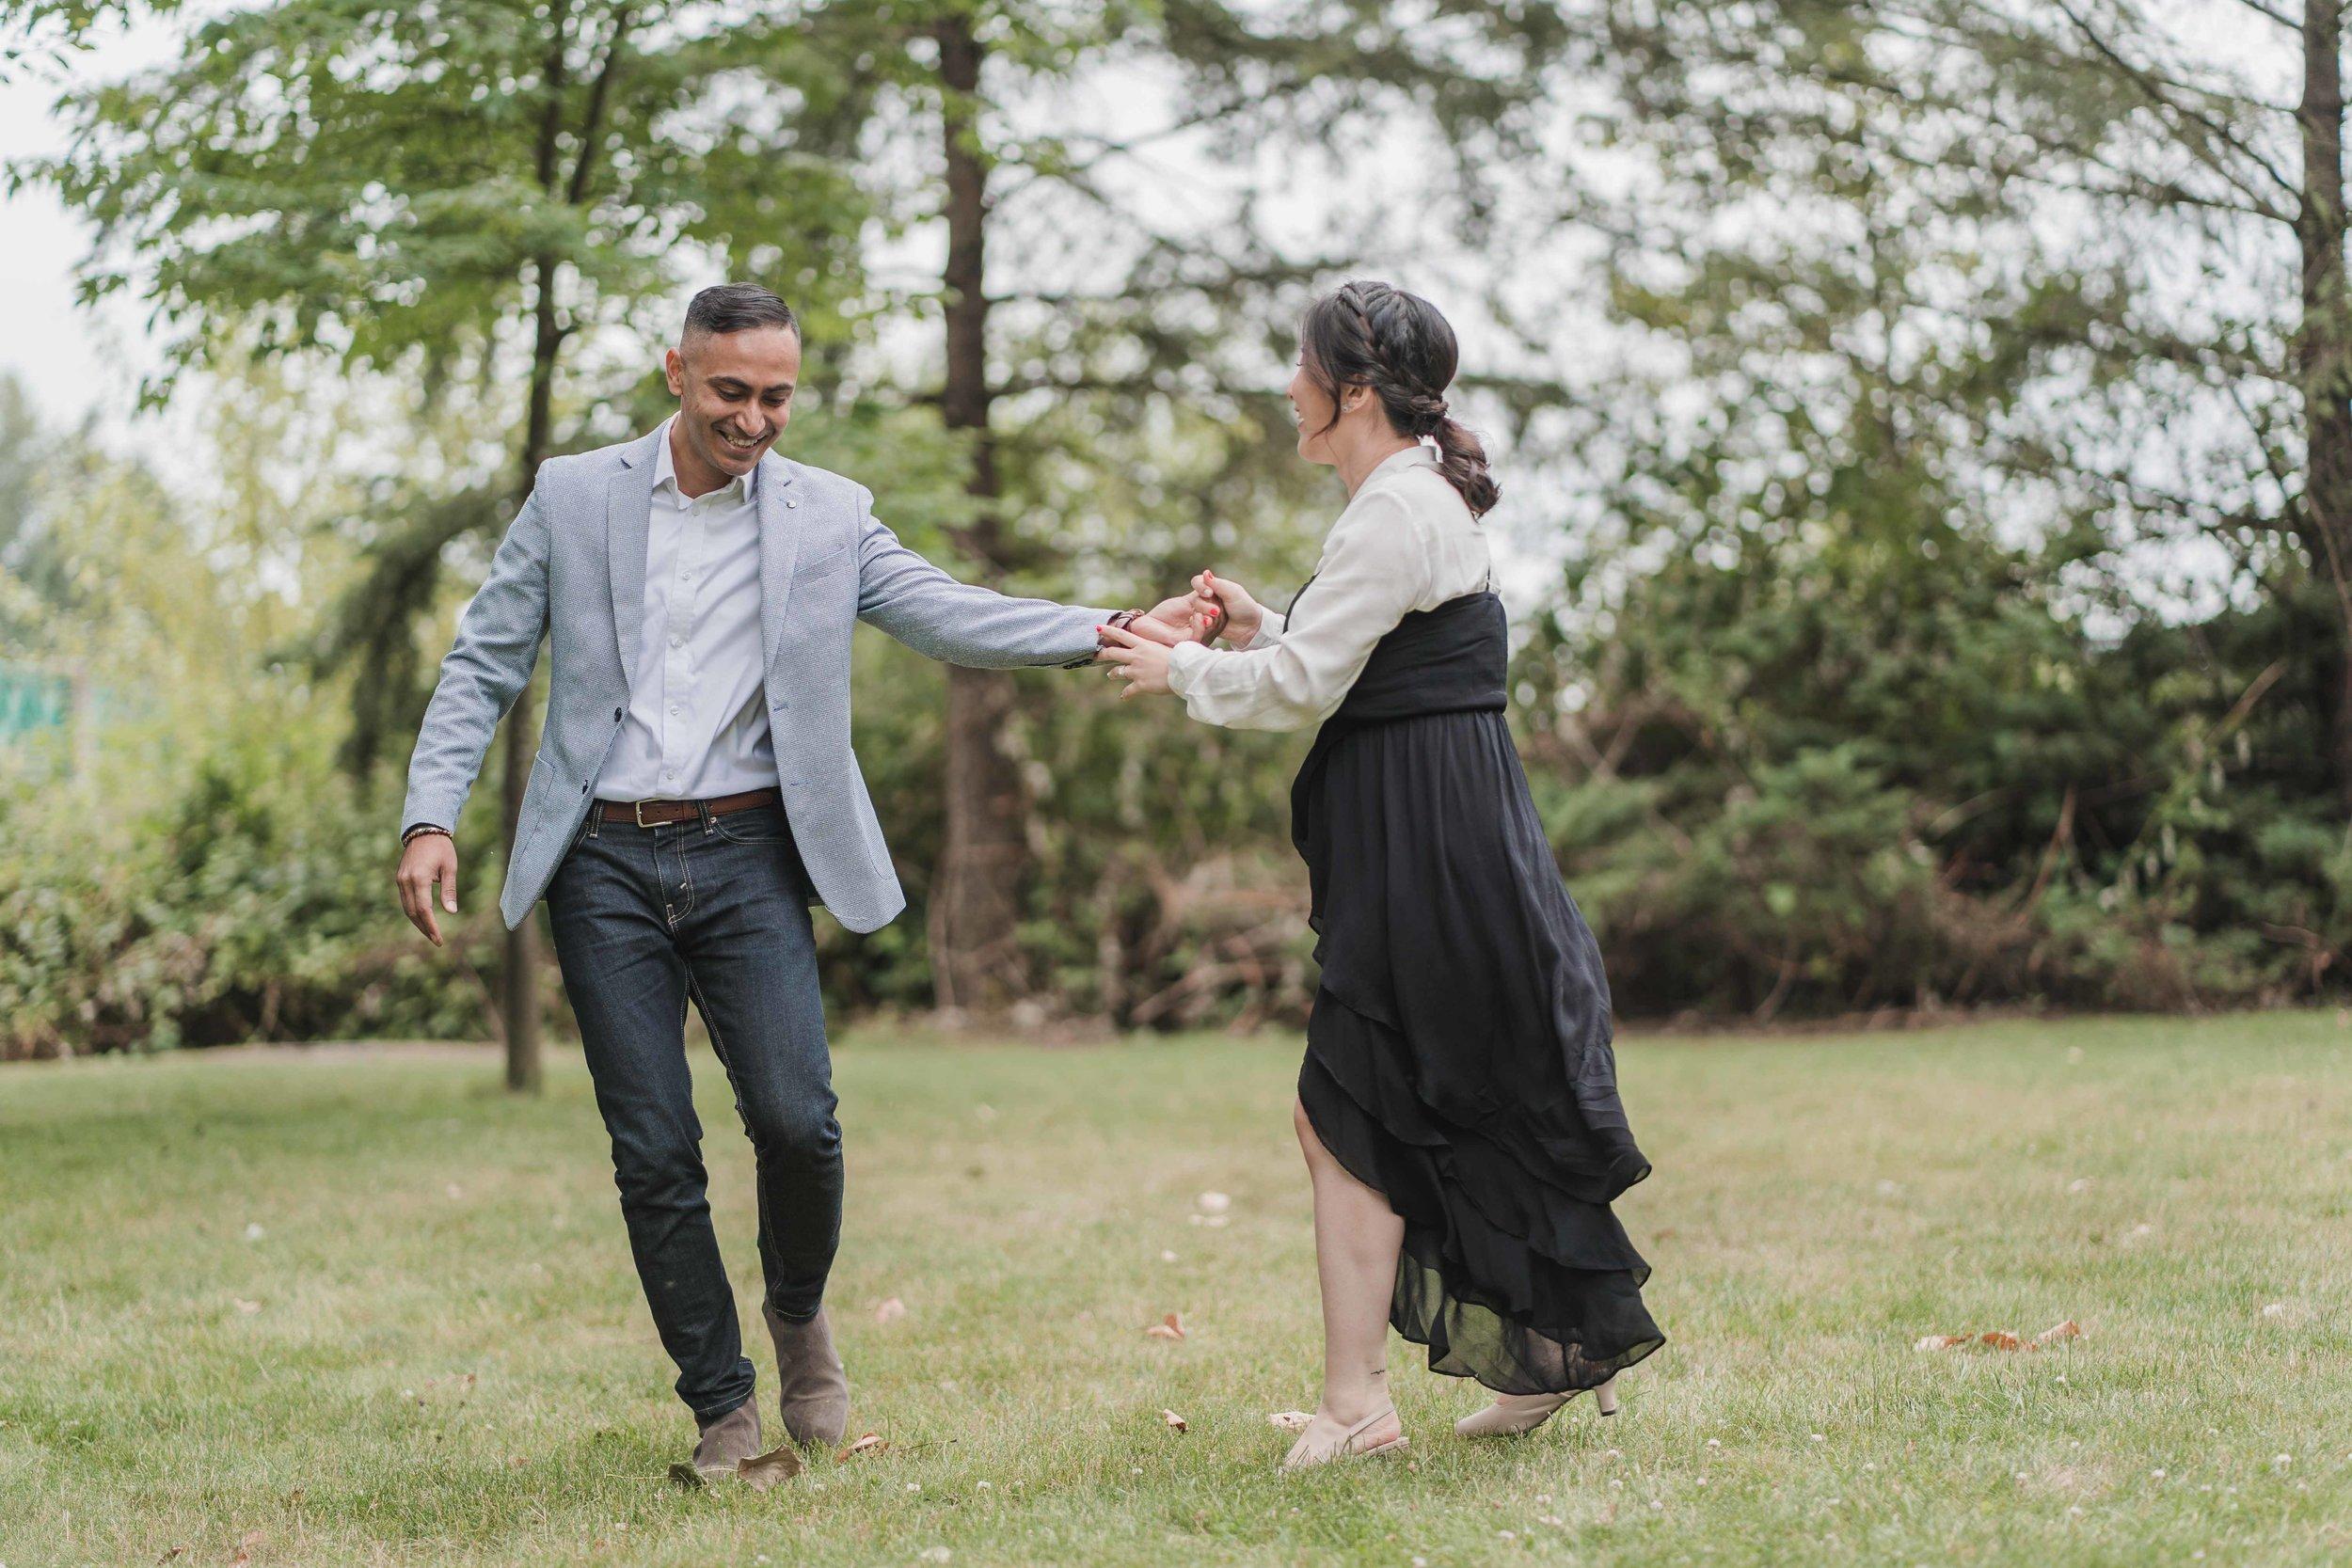 20190622 - Monika & Johnson Engagement - 0173.jpg